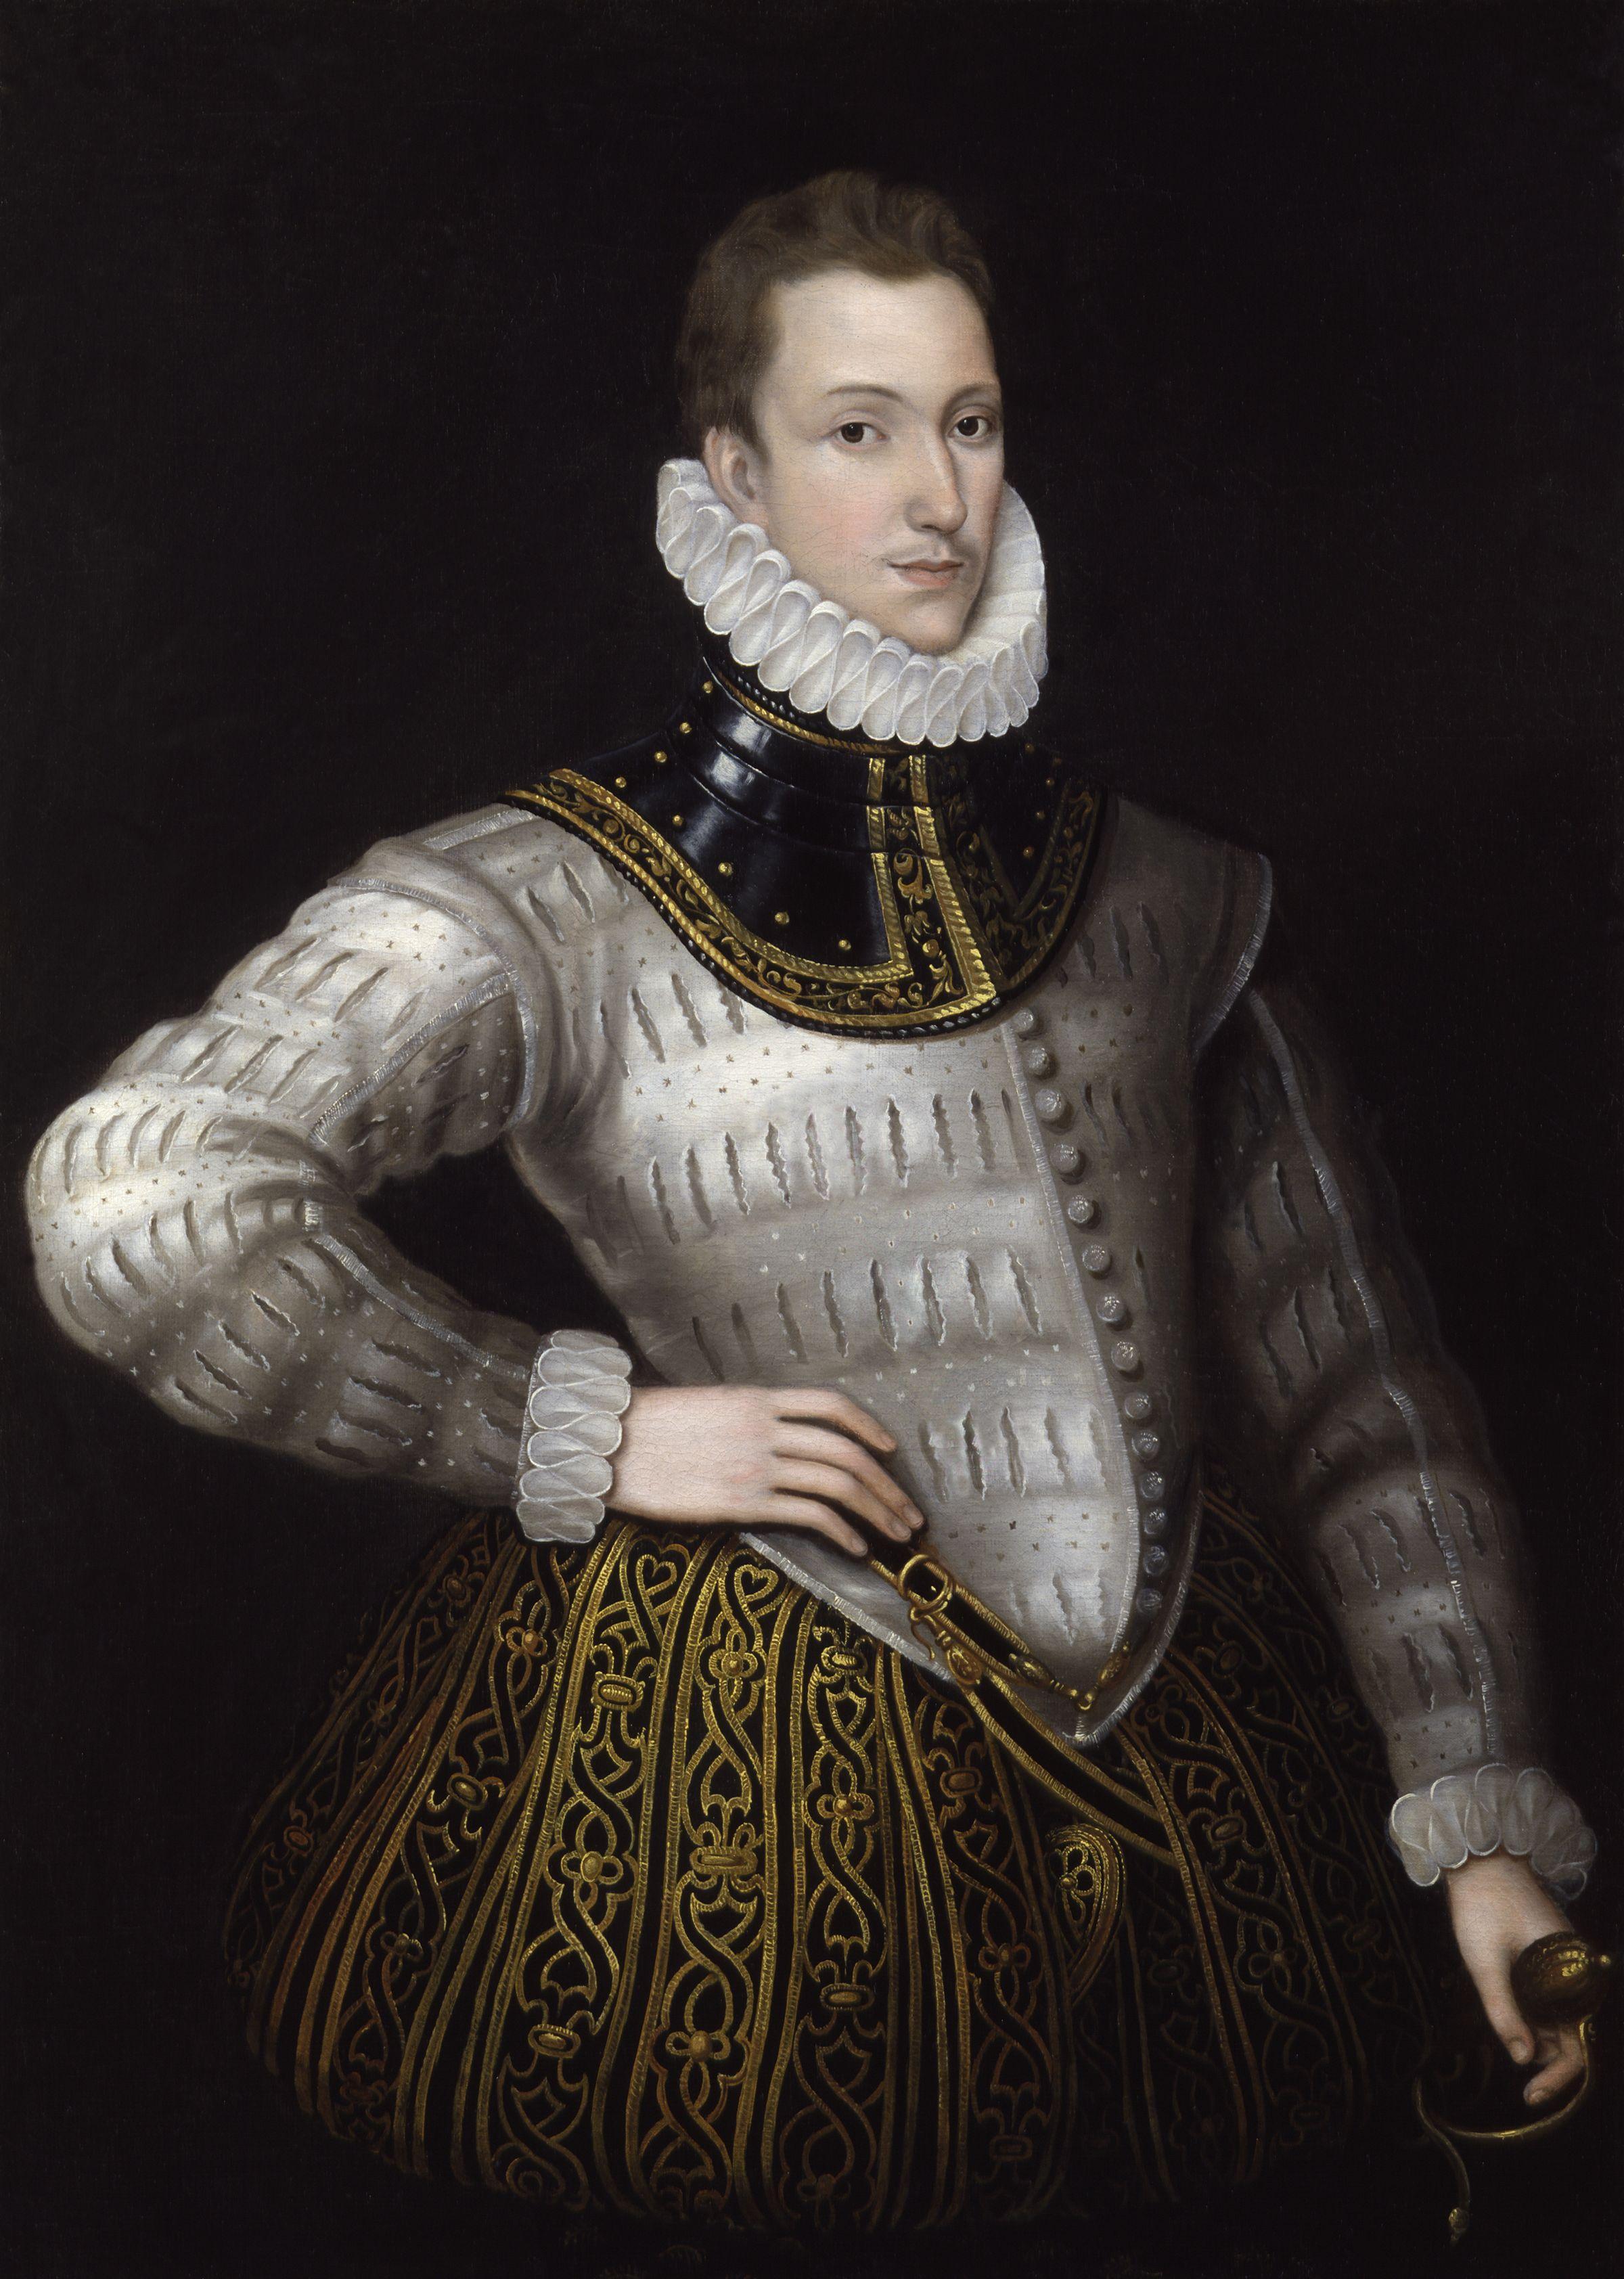 Elizabethan England...Please...HELP!!! 10 Points!!! IM FINLLY DONE!!!?